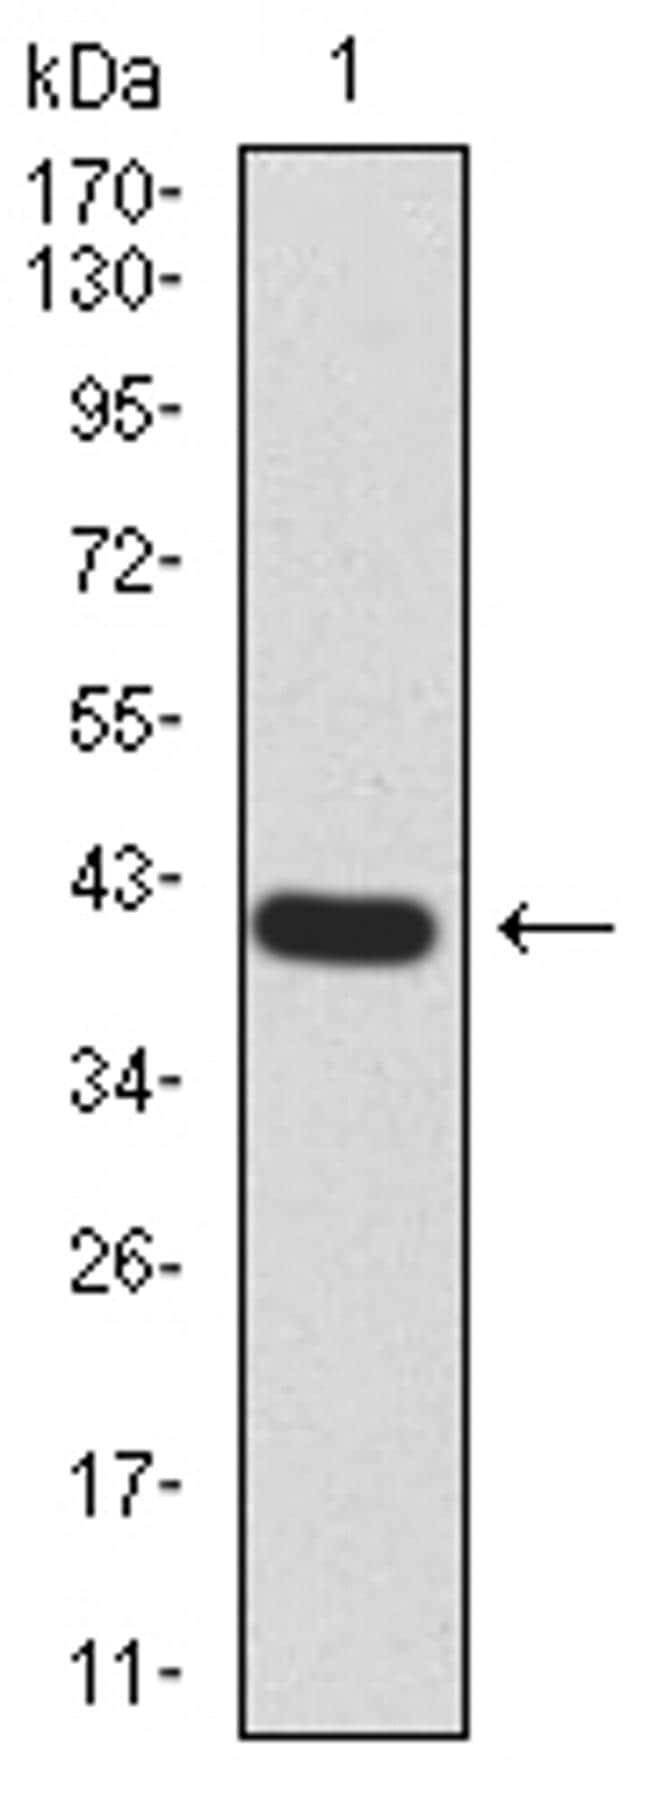 RALA Antibody in Western Blot (WB)